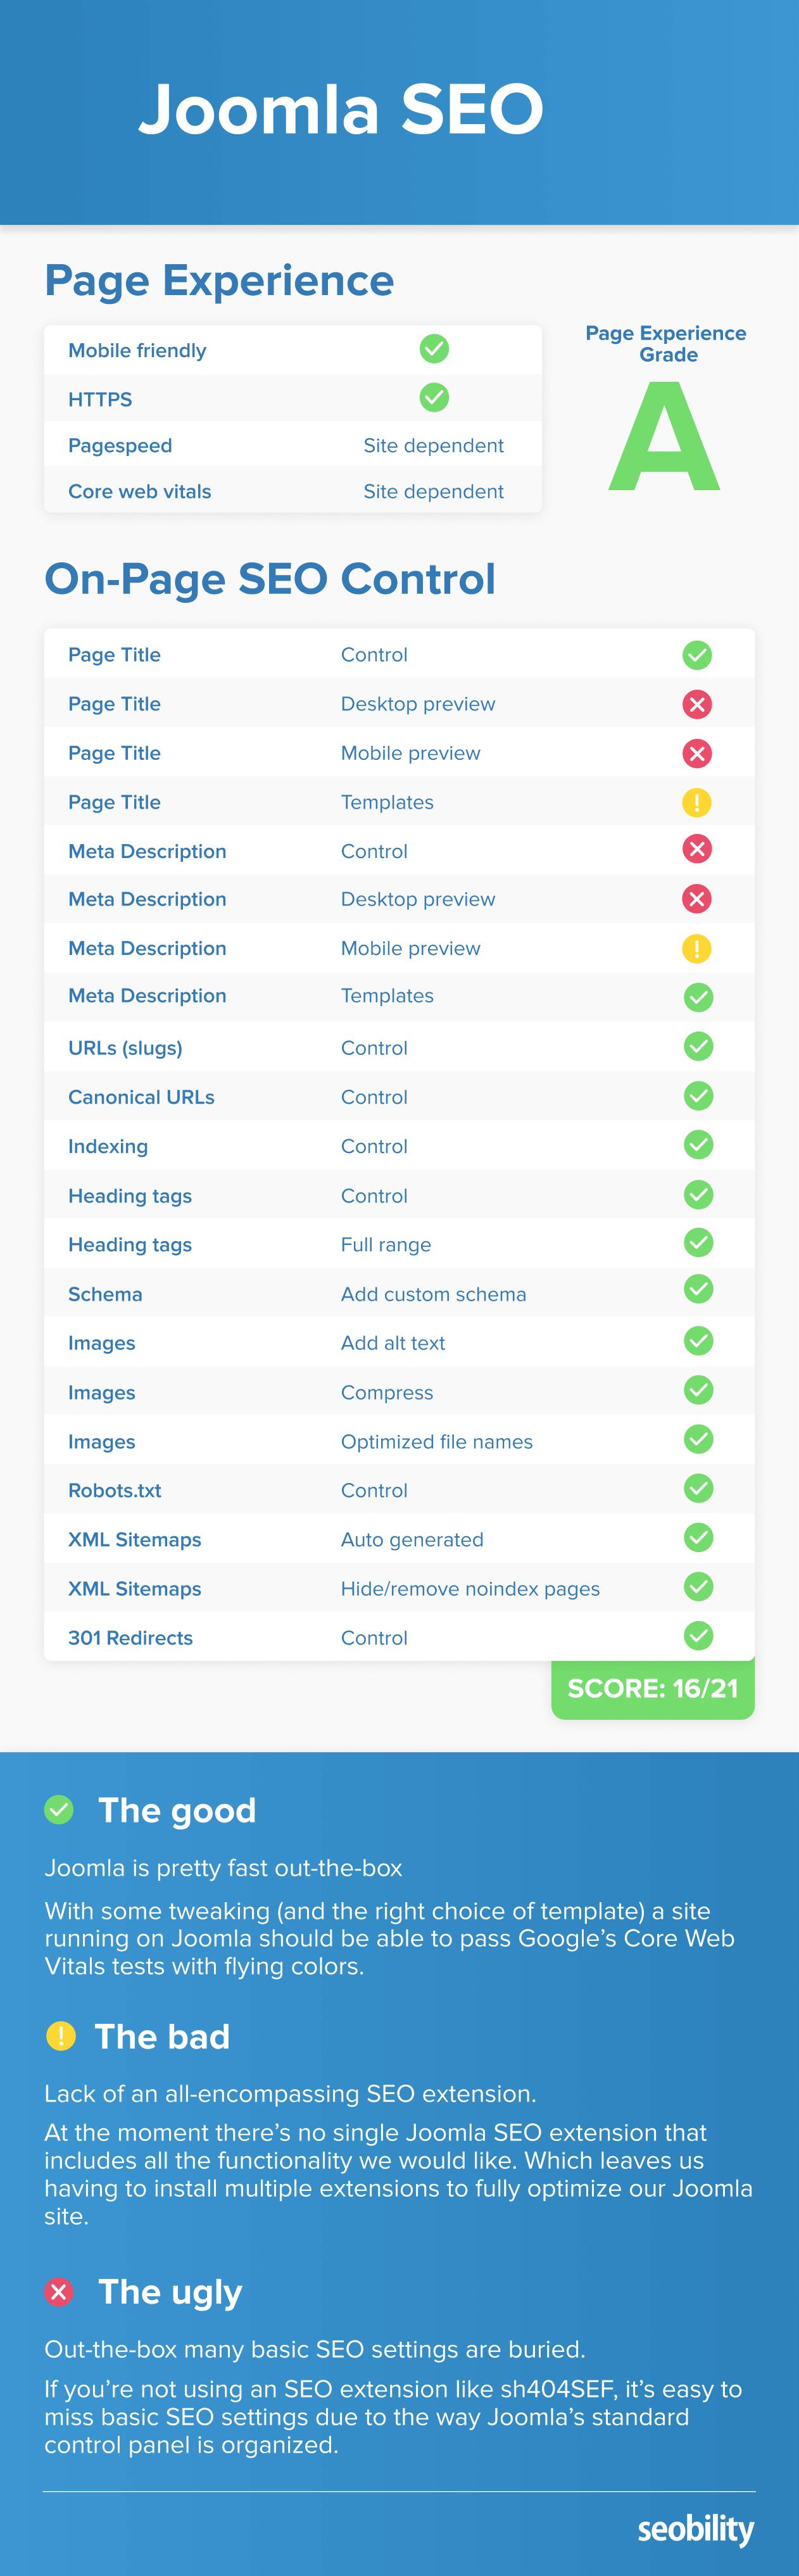 Joomla CMS SEO Score